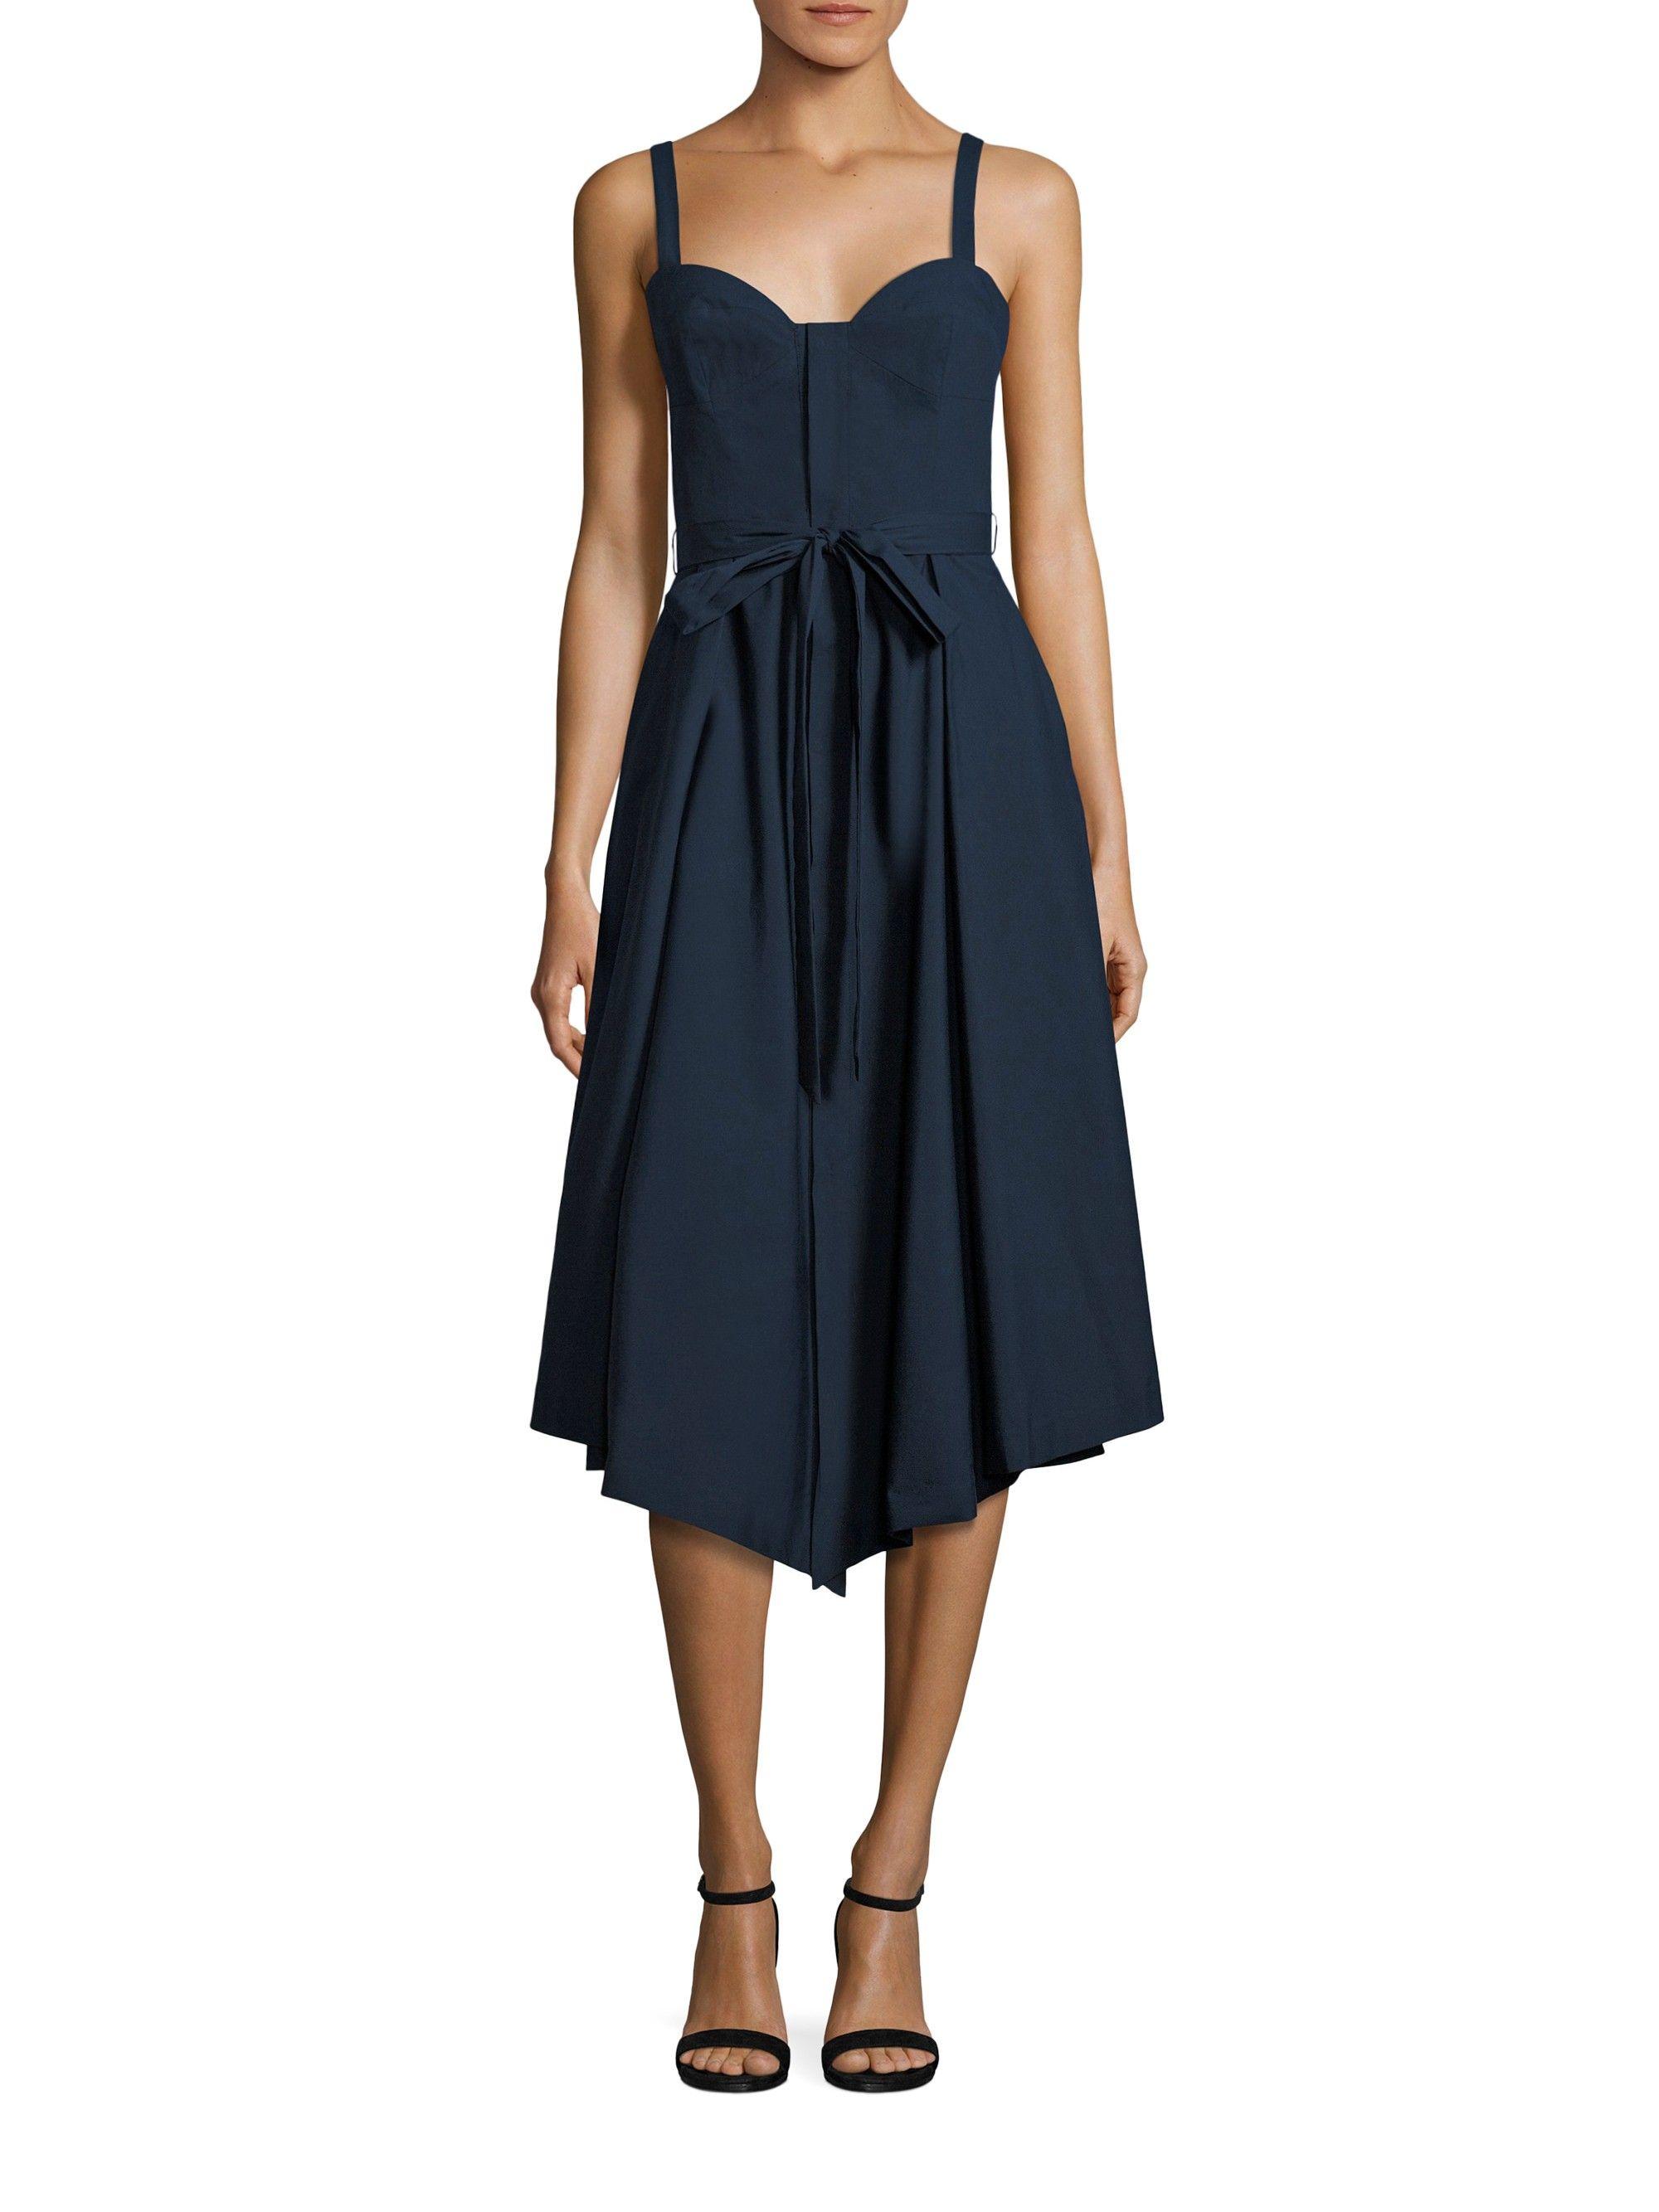 Bustier Midi Dress, Navy | Midi dresses, Navy and Shopping